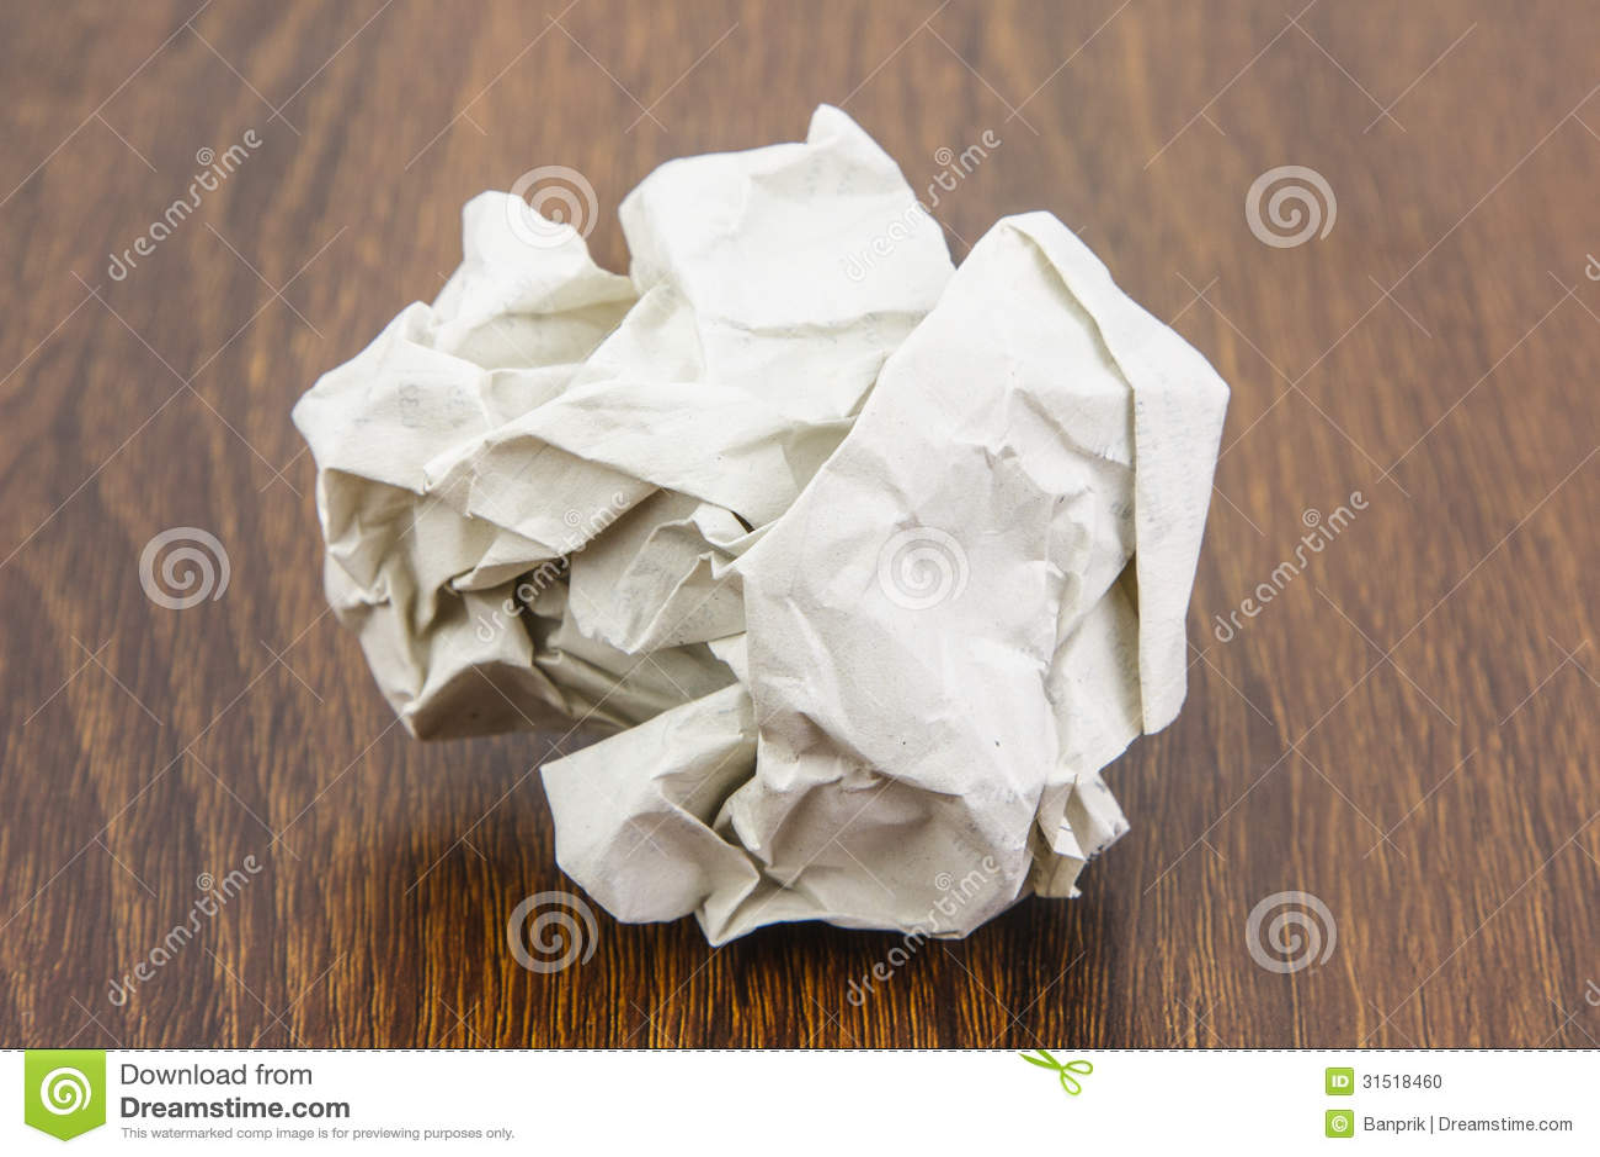 Piłka papieru prześcieradło